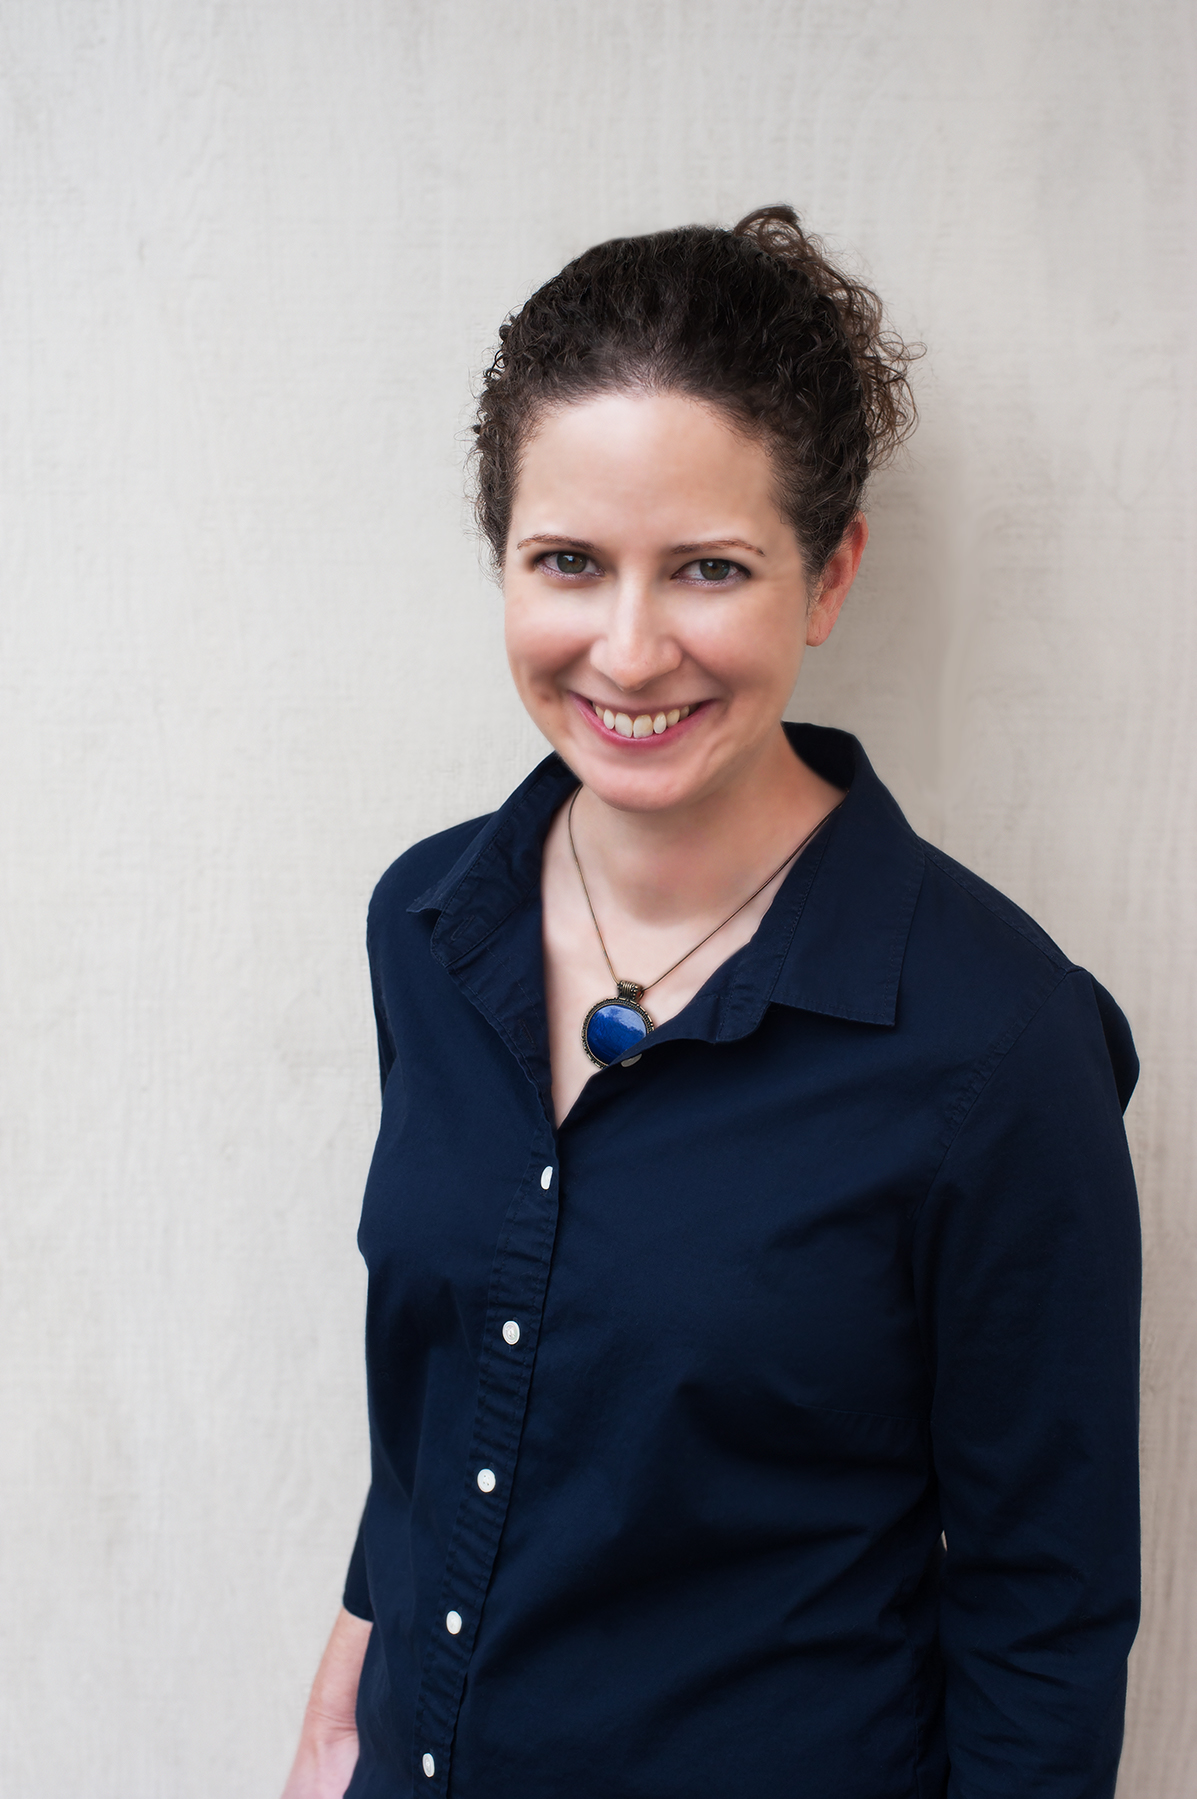 Team Yogurt Founder Cheryl Sternman Rule | Photograph by Danielle Tsi